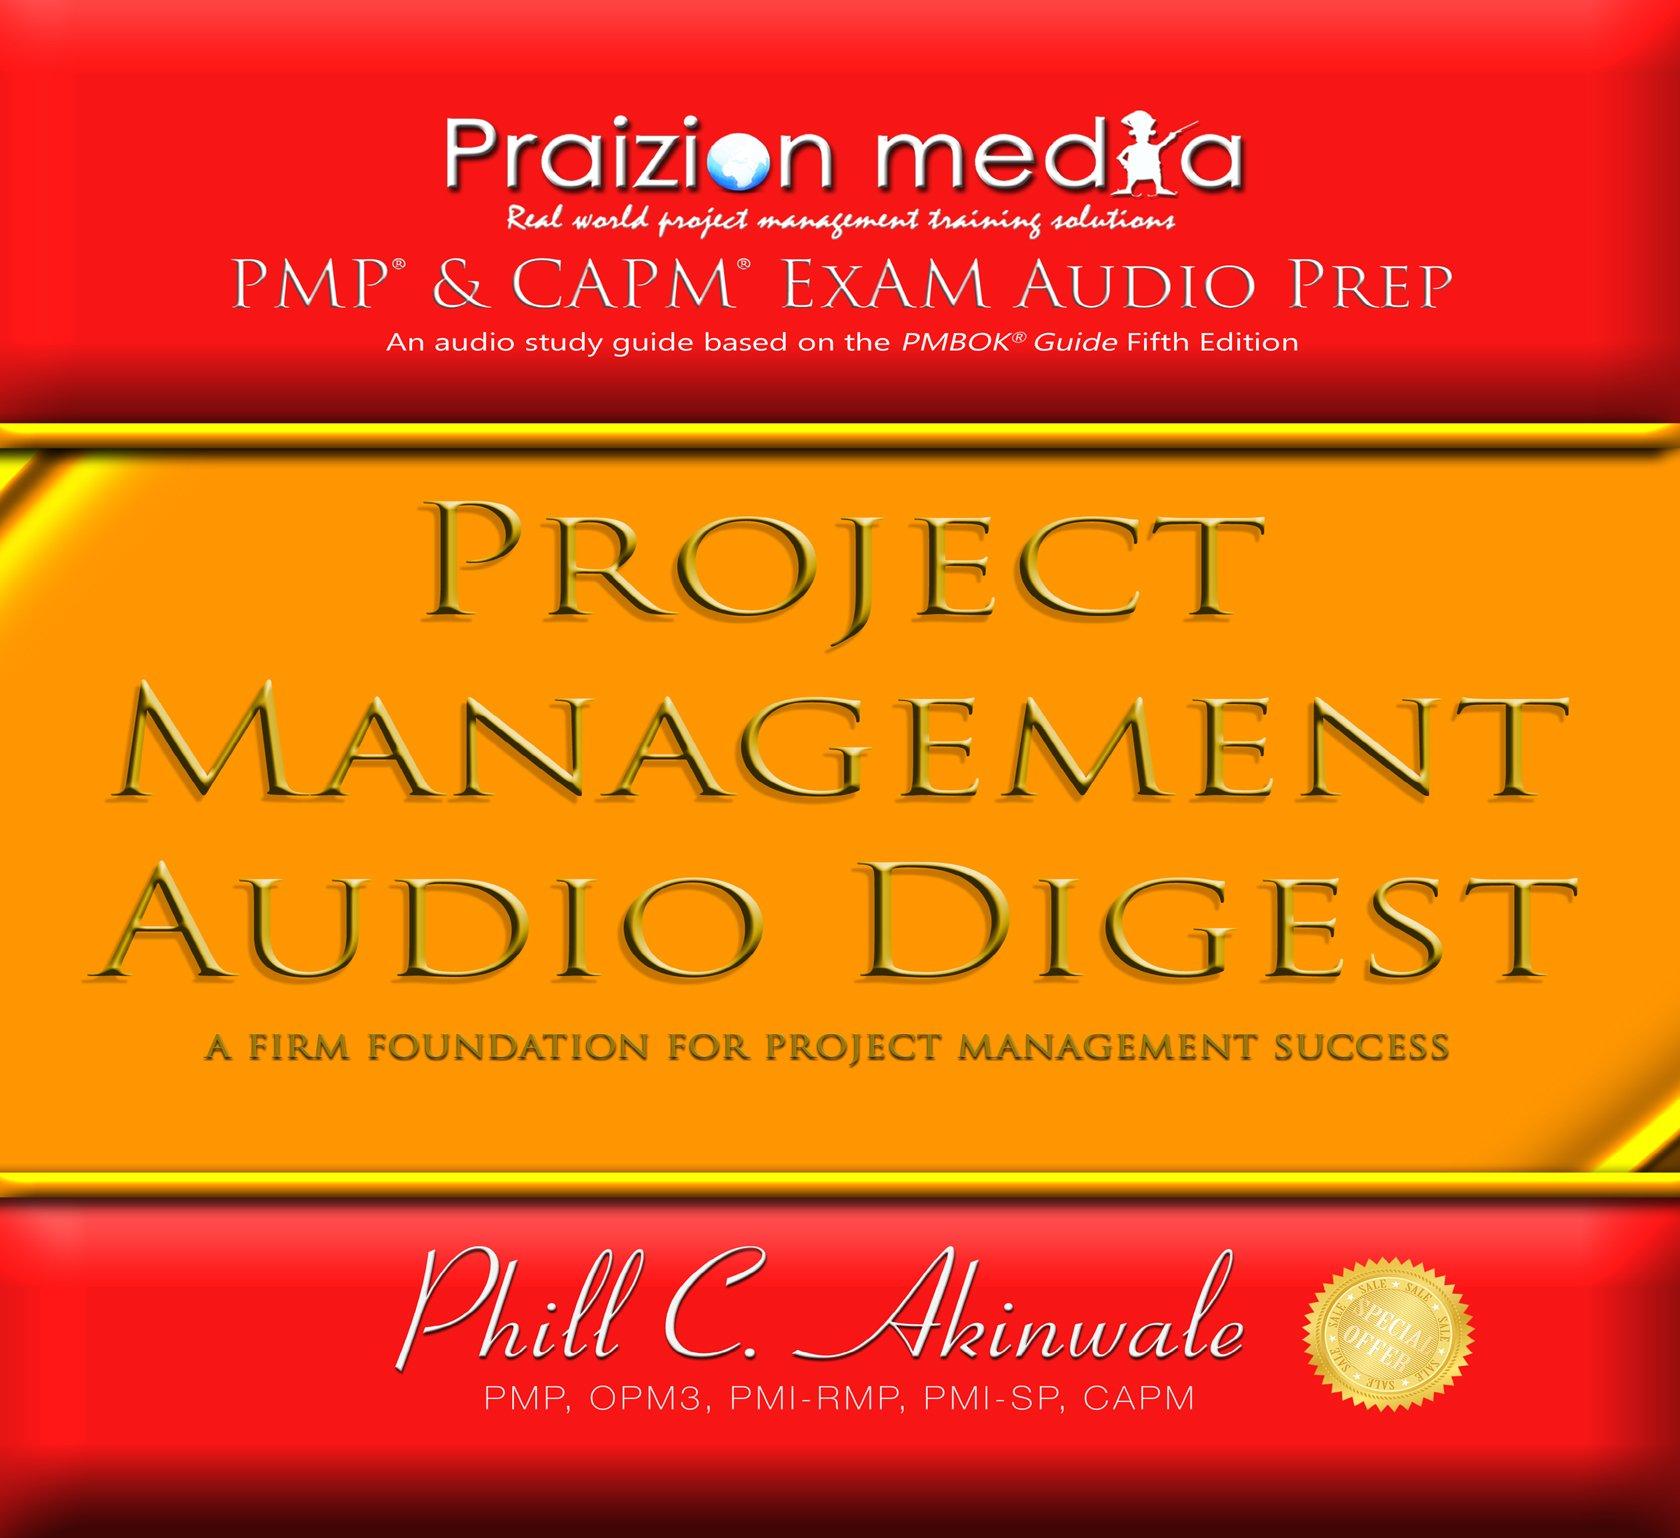 Project Management Audio Digest: 18 PMP Exam Audio CDs (PMBOK 5th Ed):  Praizion Media, PMP Phill C. Akinwale: 9781934579985: Amazon.com: Books